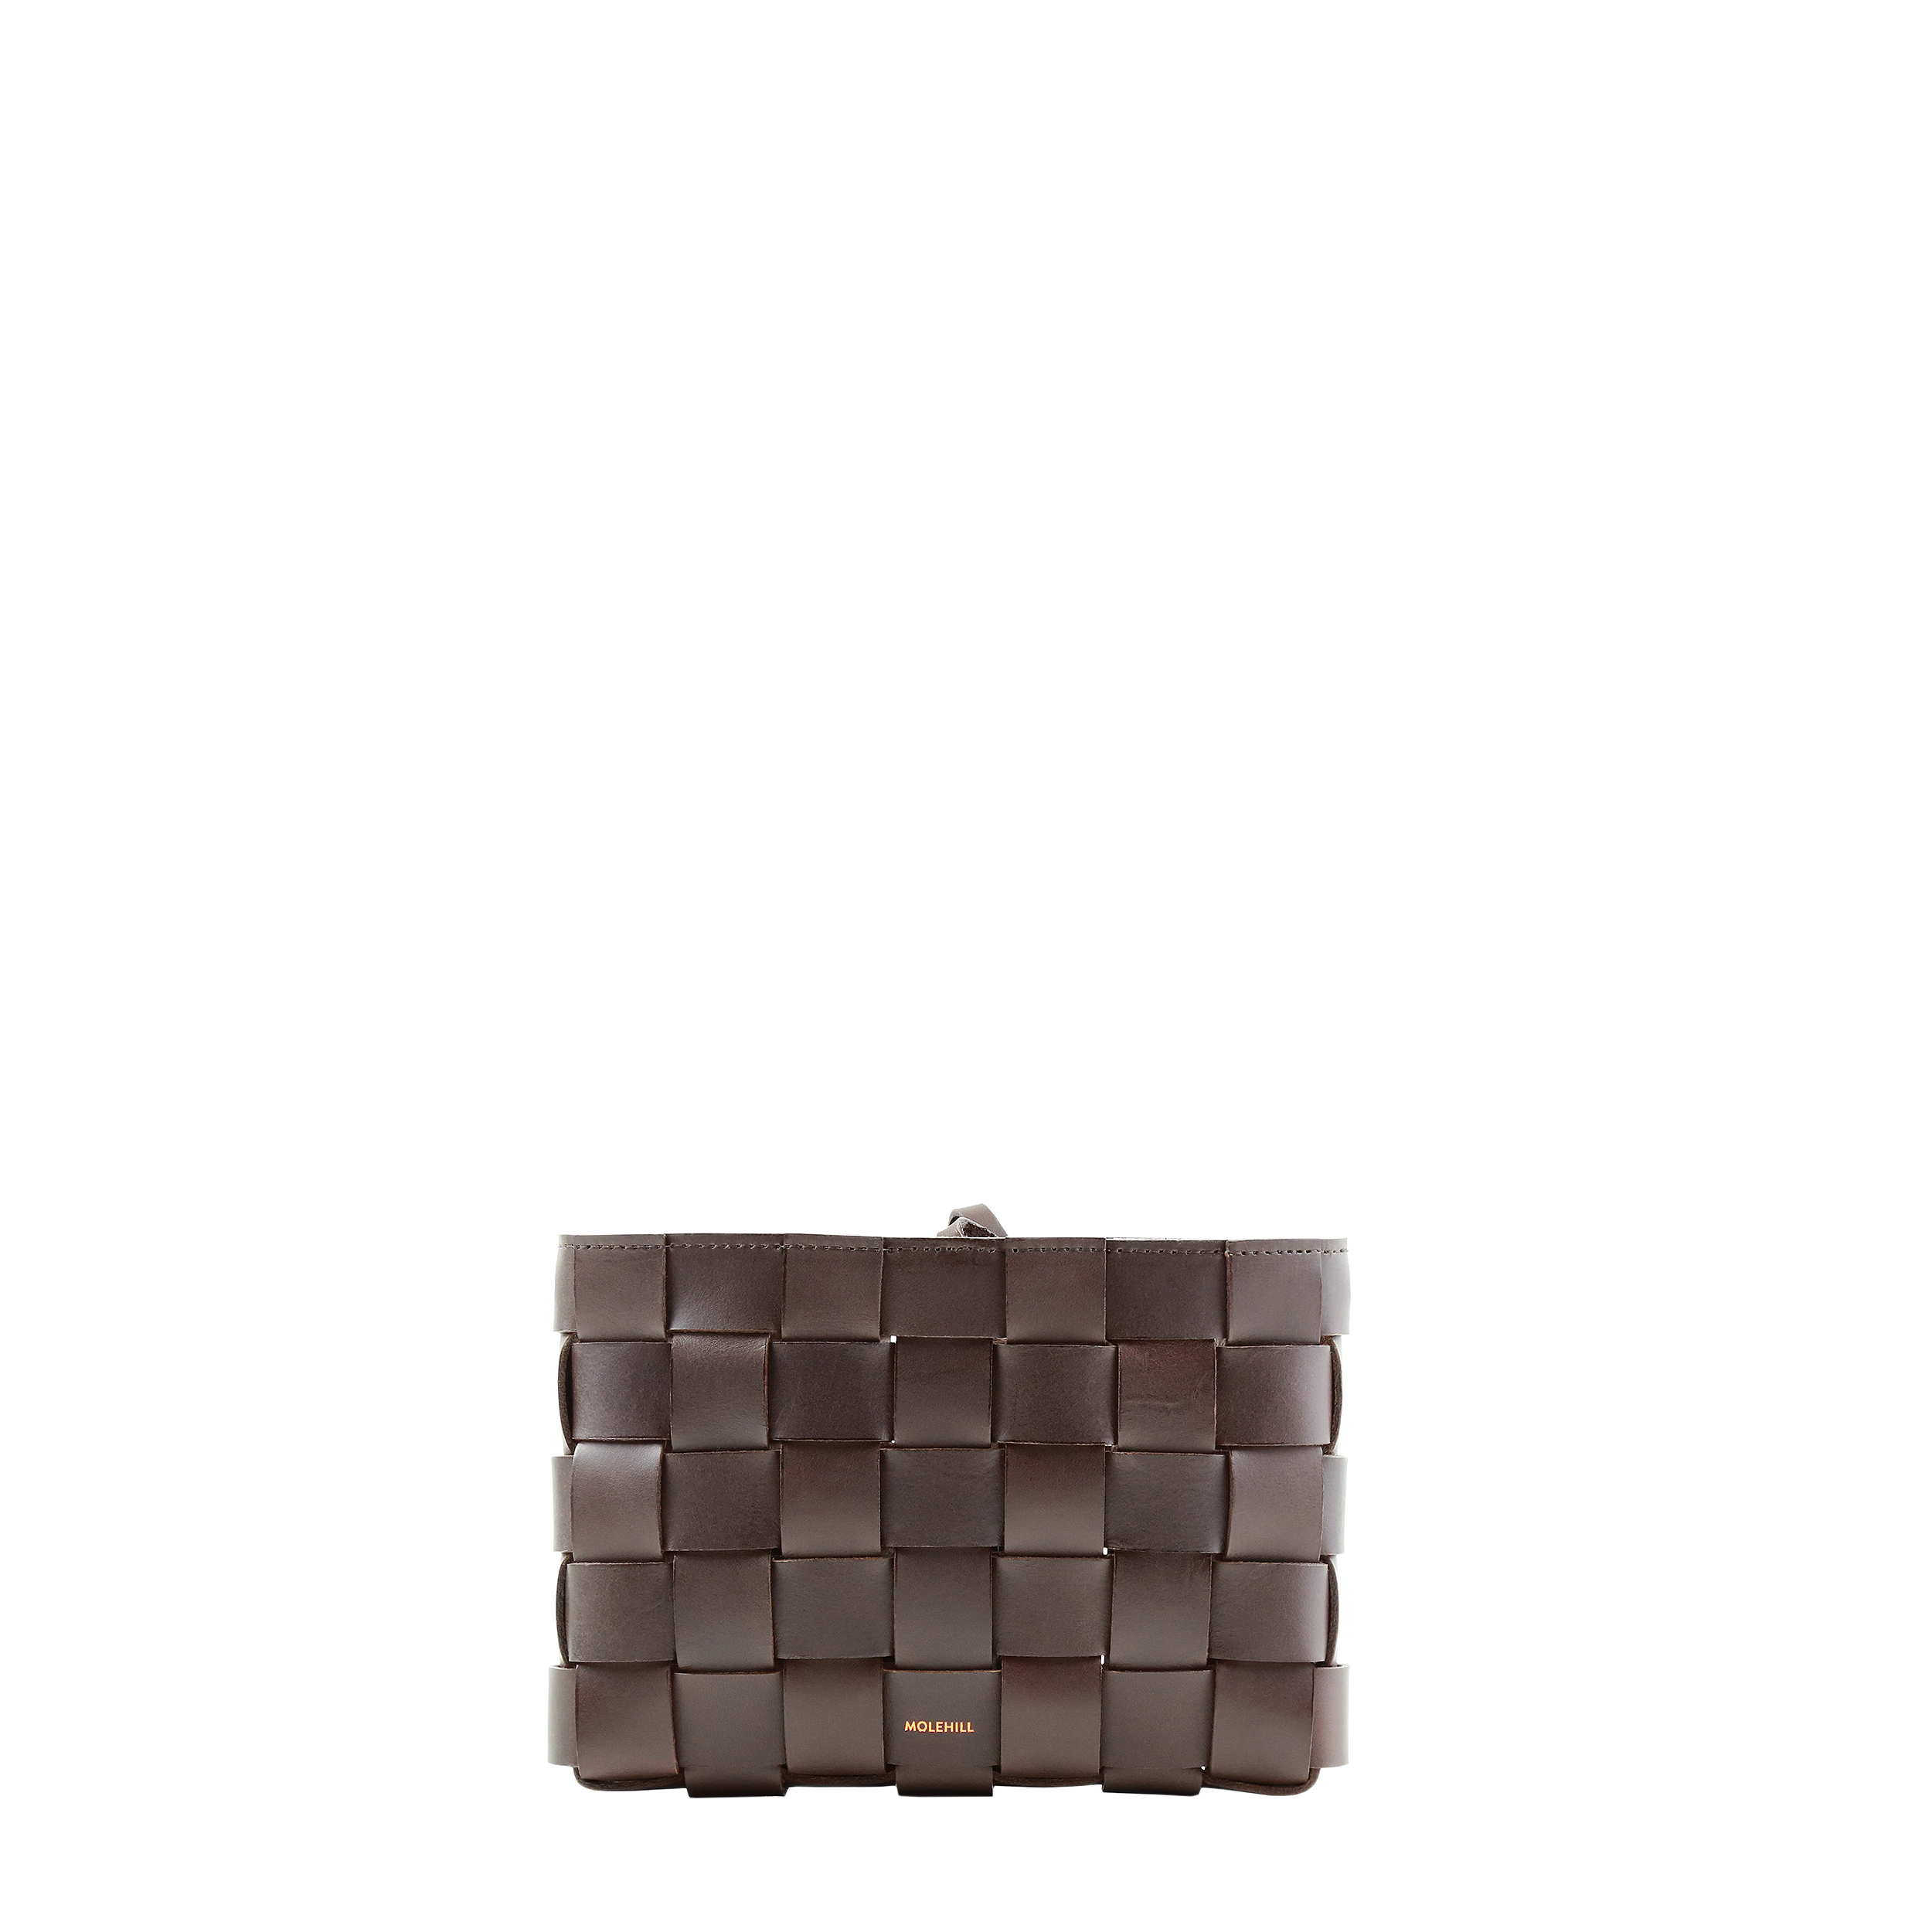 Pane Crossbody Woven Bag Dark Brown-3